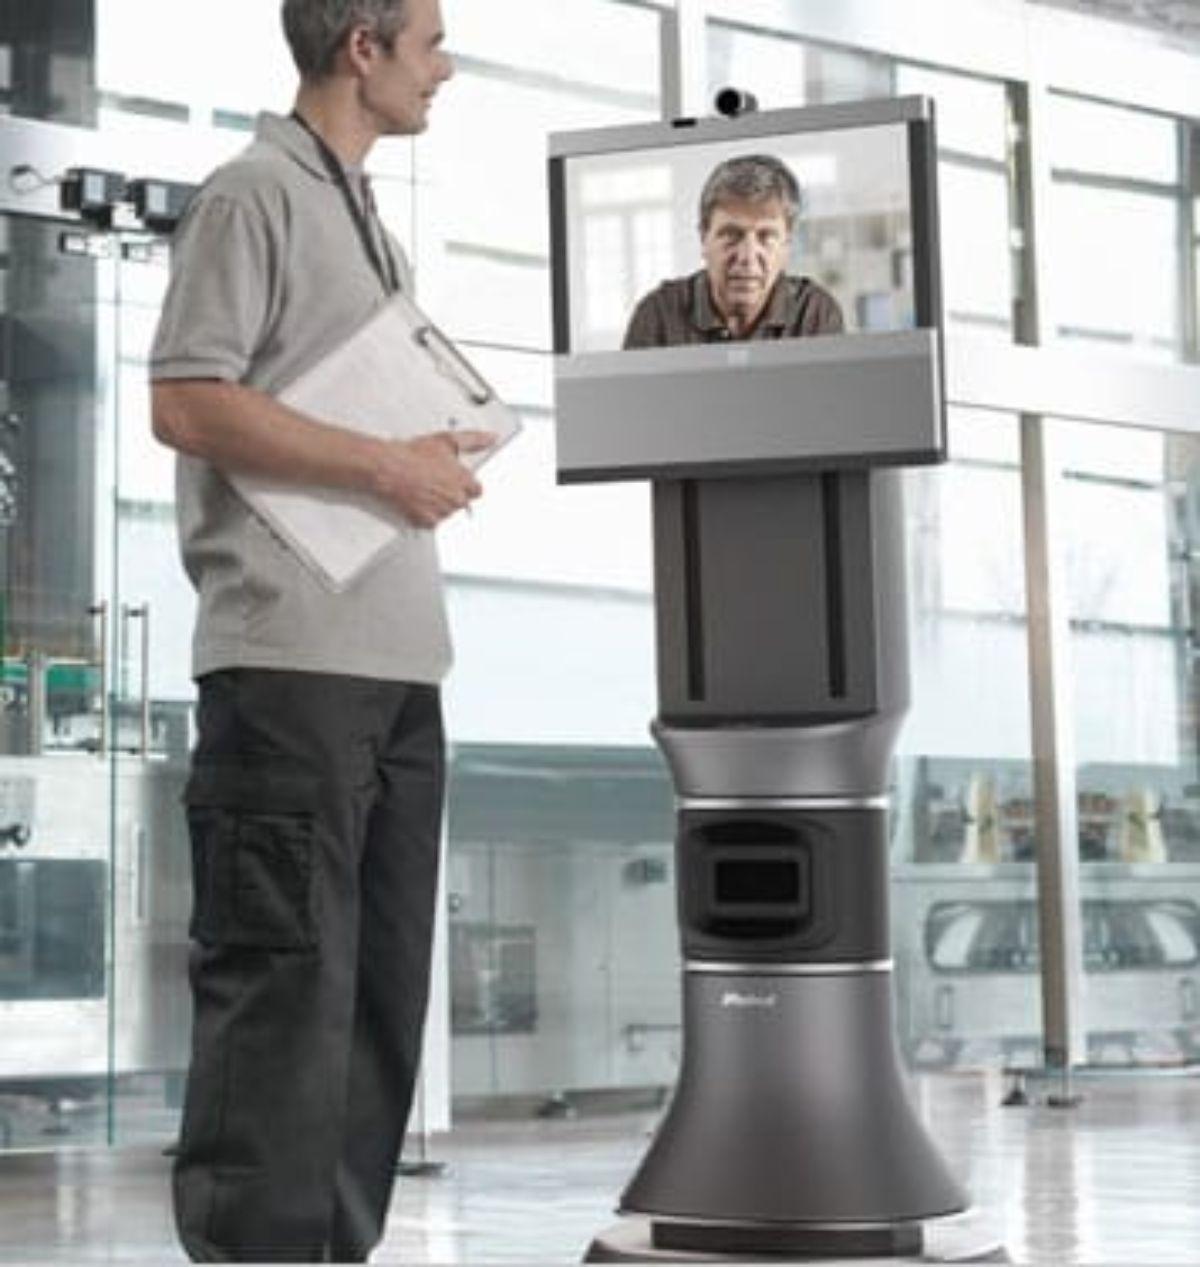 El robot de iRobot para mantener reuniones de telepresencia.